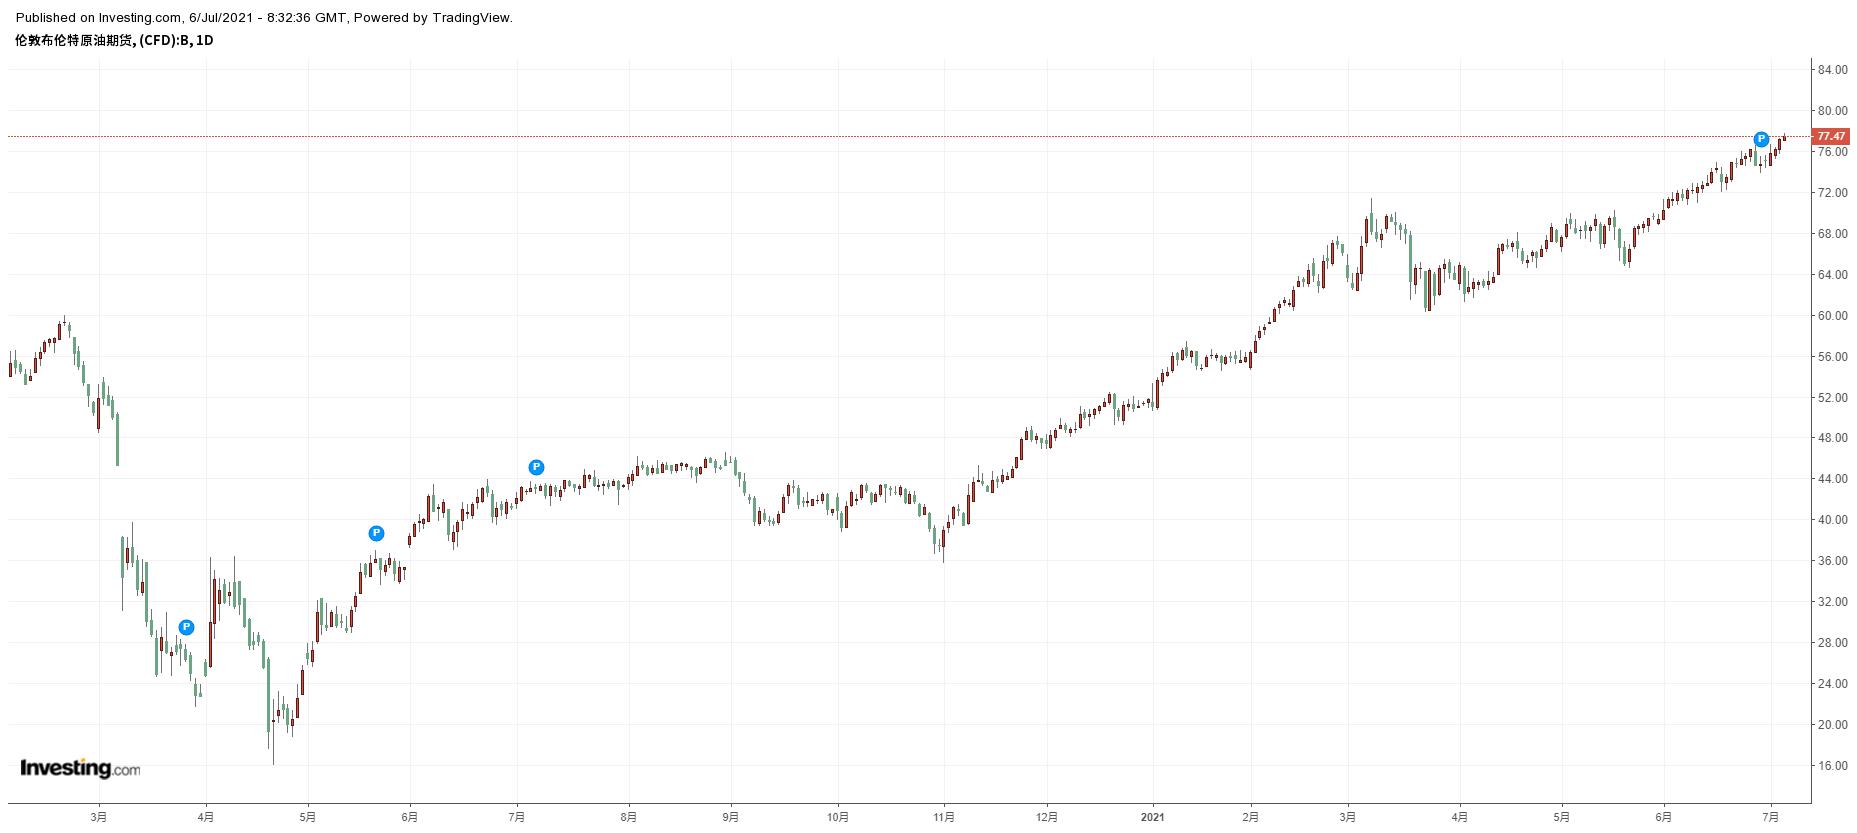 布伦特原油日线,来源Investing.com